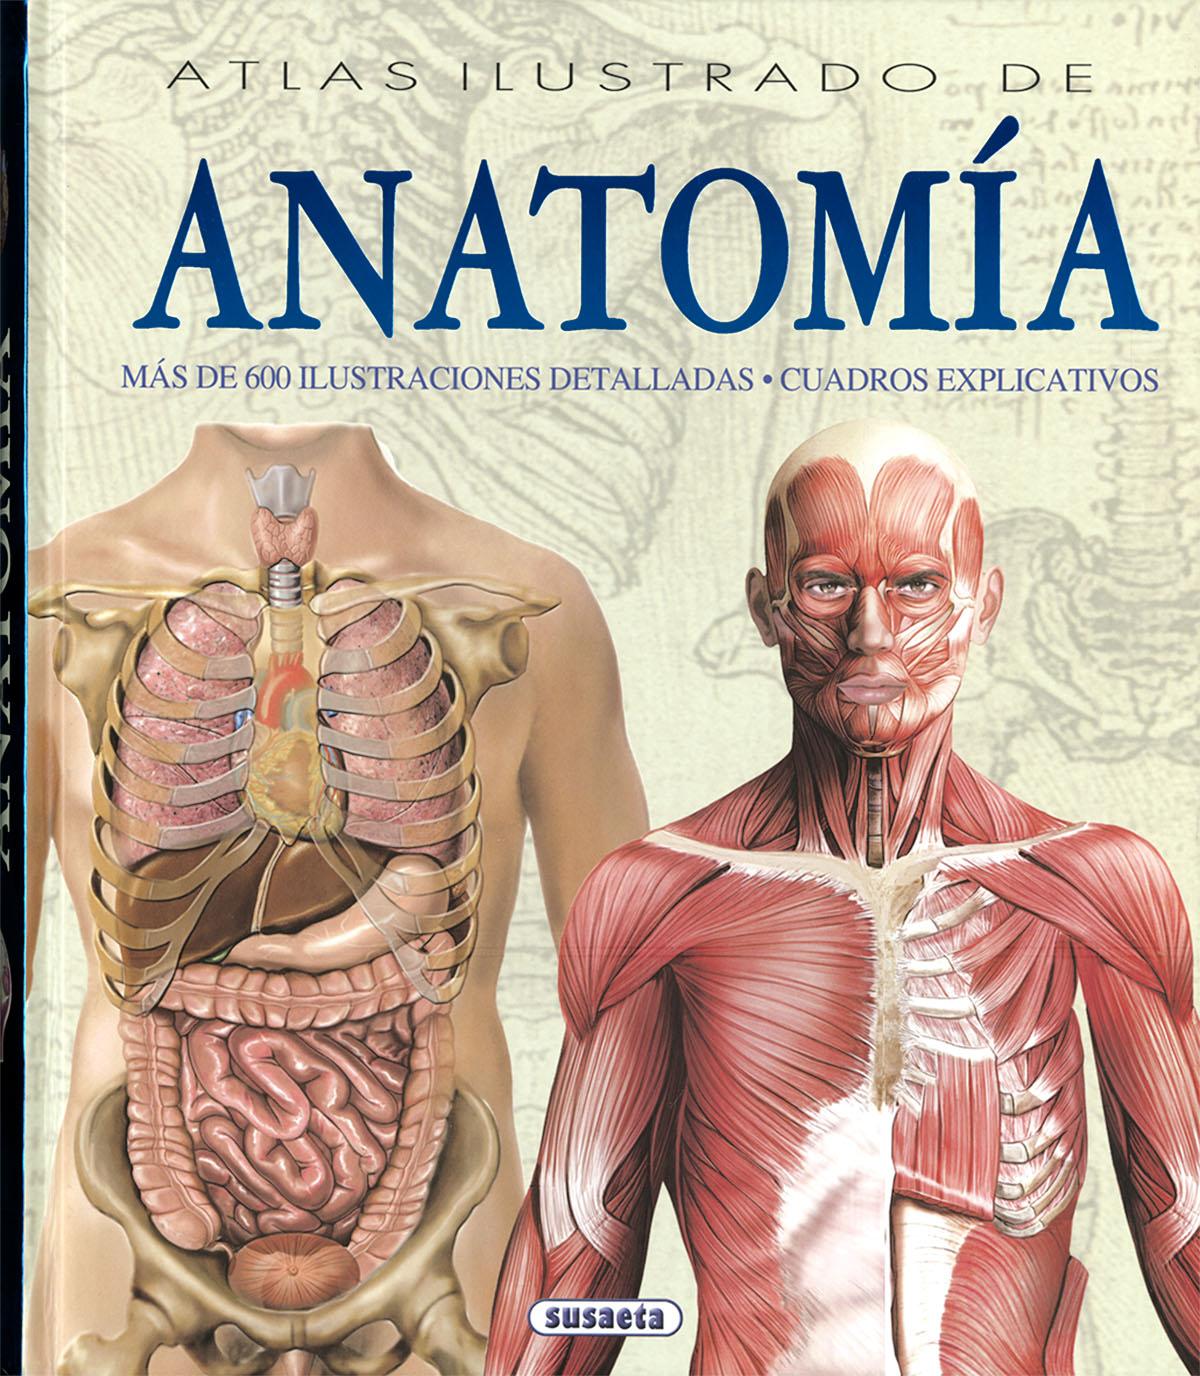 ATLAS ILUSTRADO DE ANATOMIA | ADRIANA RIGUTTI | Comprar libro ...